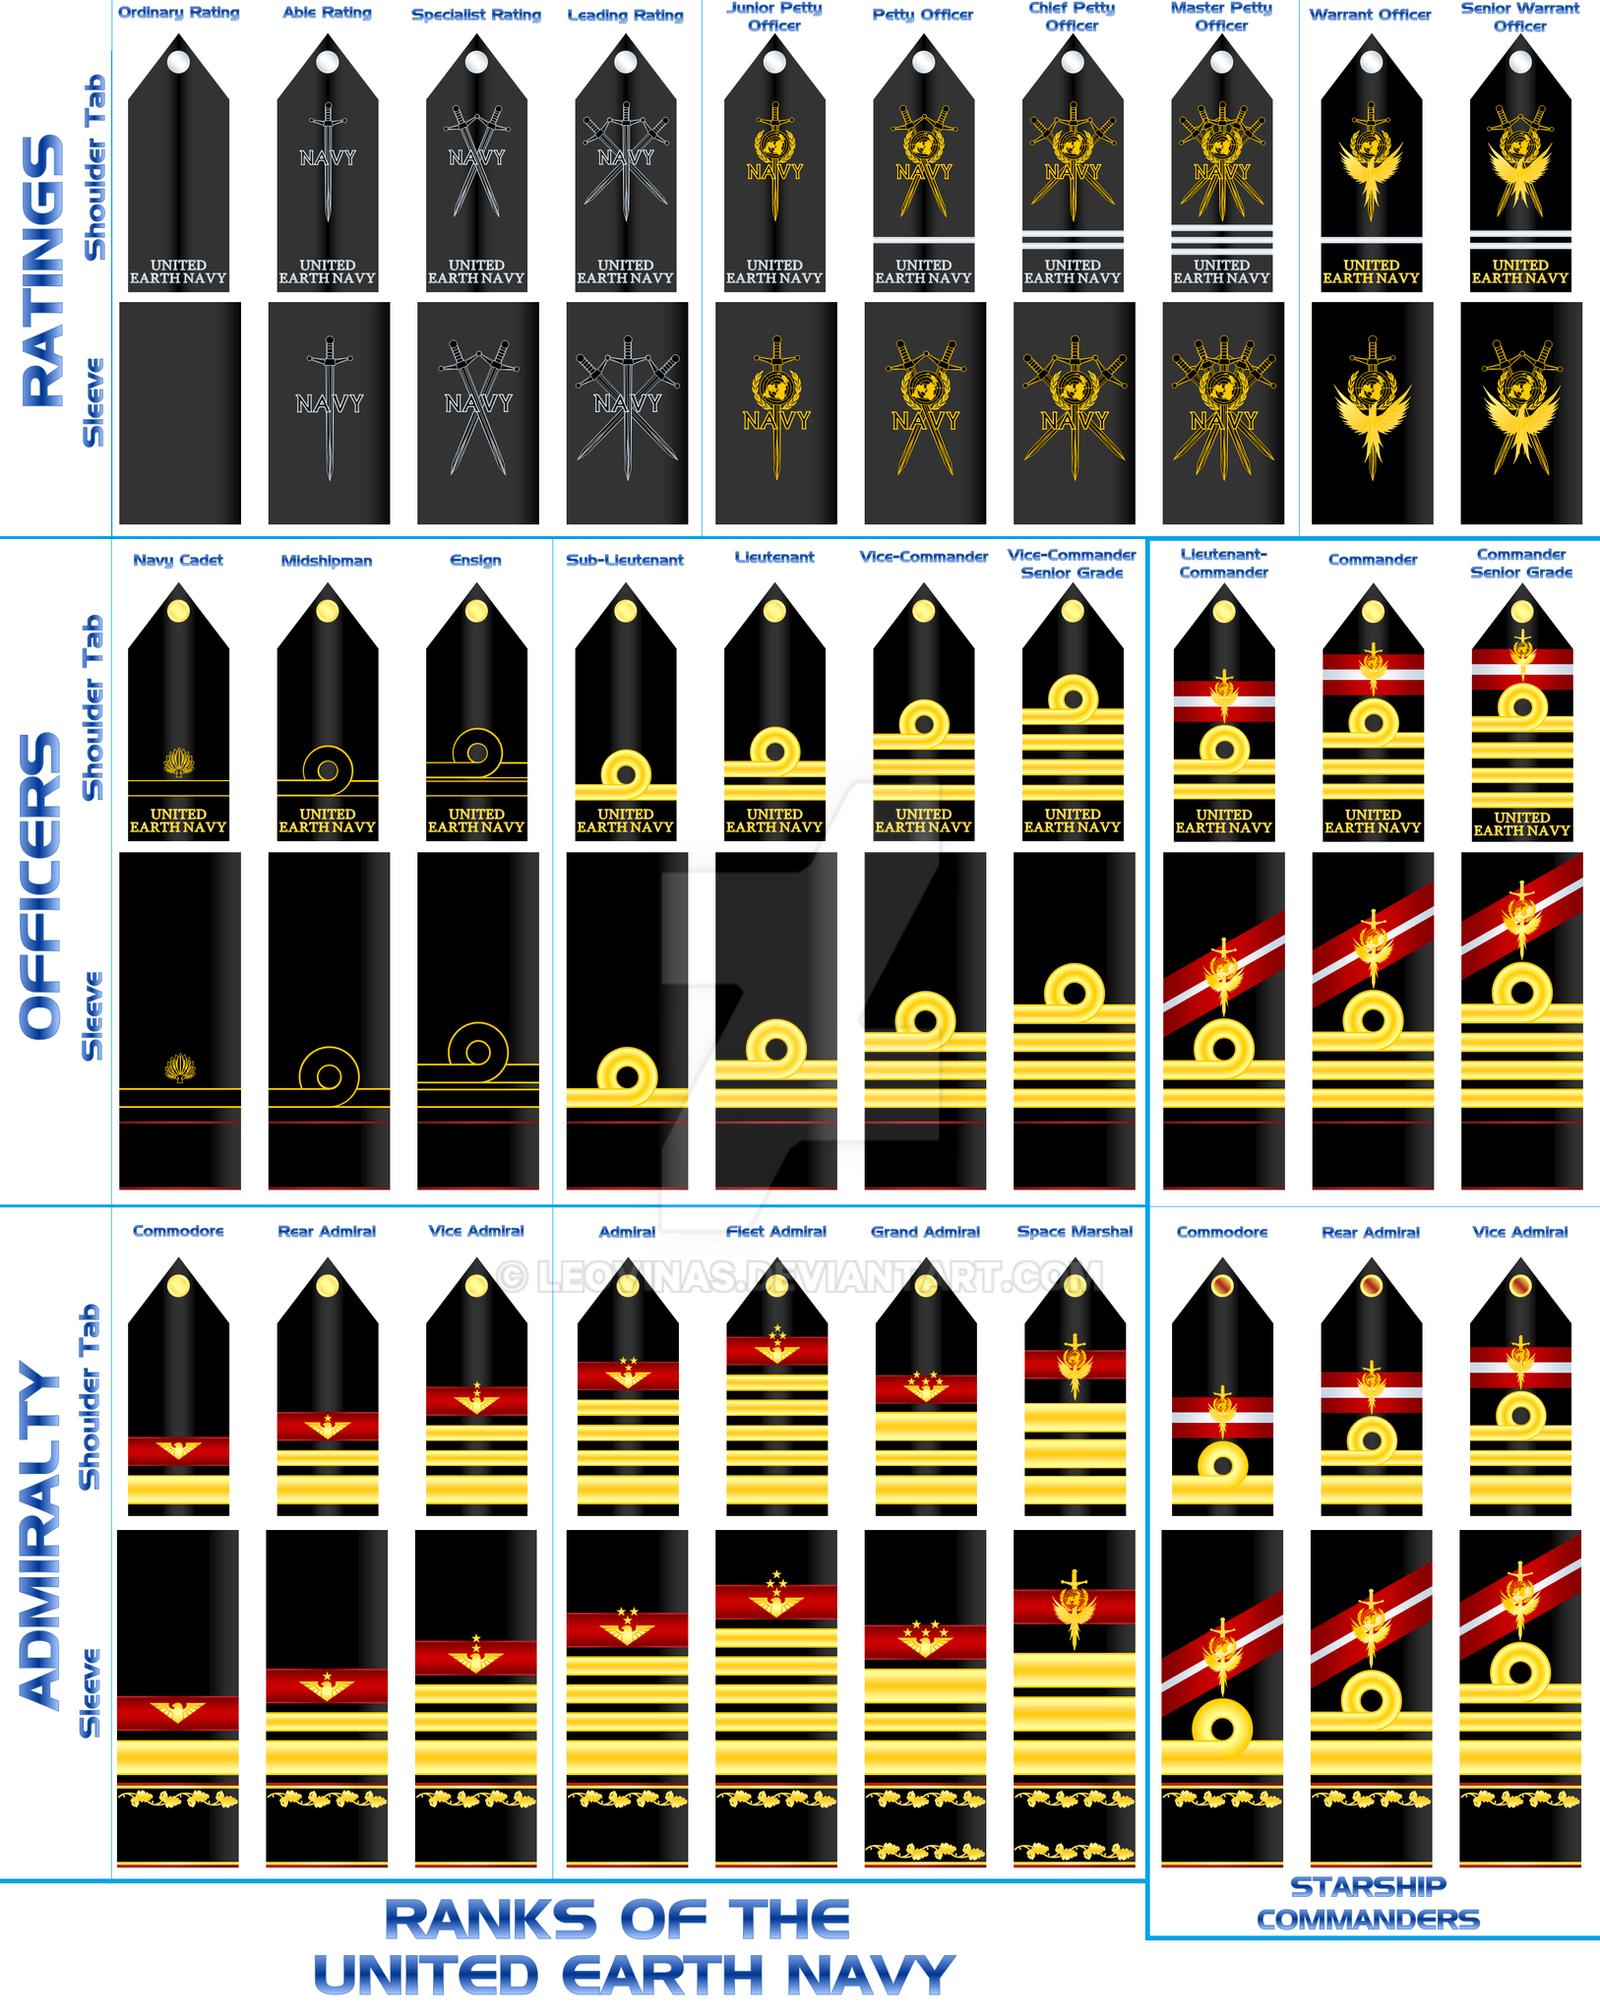 Ranks of the United Earth Navy by Leovinas on DeviantArt